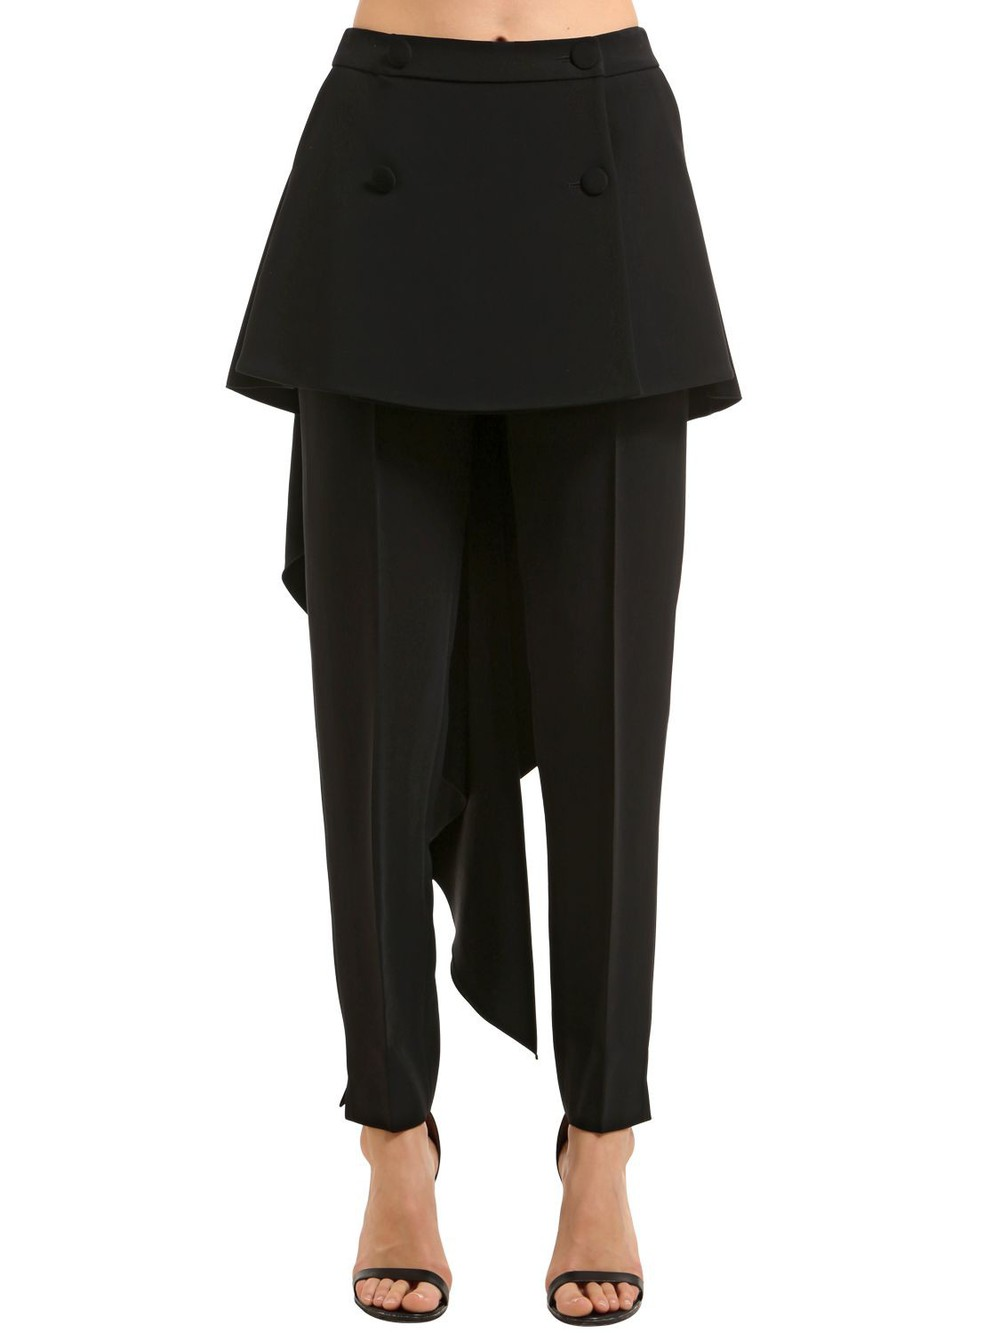 ANTONIO BERARDI Stretch Cady Pants W/ Skirt Panels in black